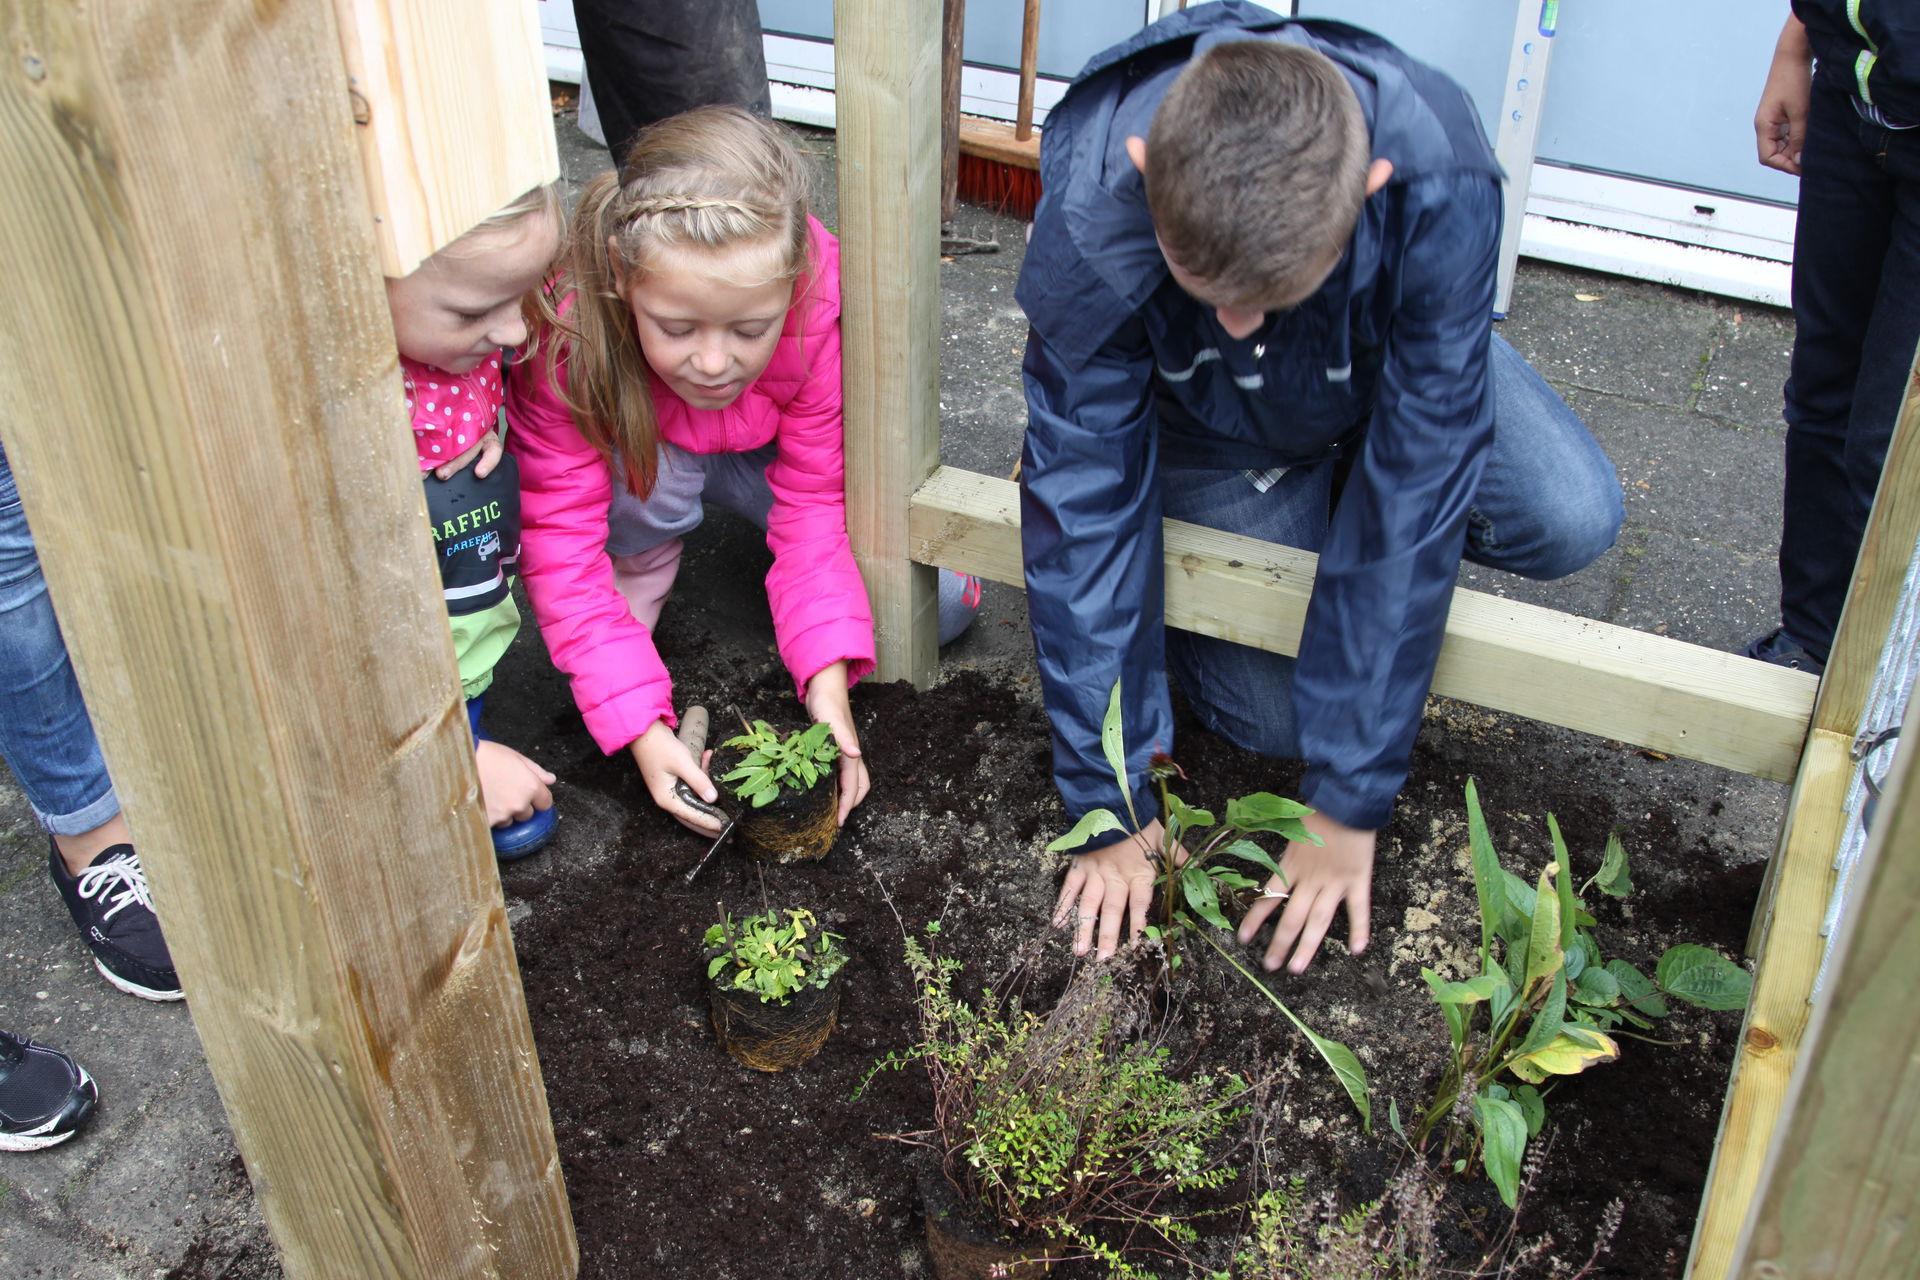 Vierkante Meter Tuin : Vierkante meter tuin te koop in dilbeek tweedehands